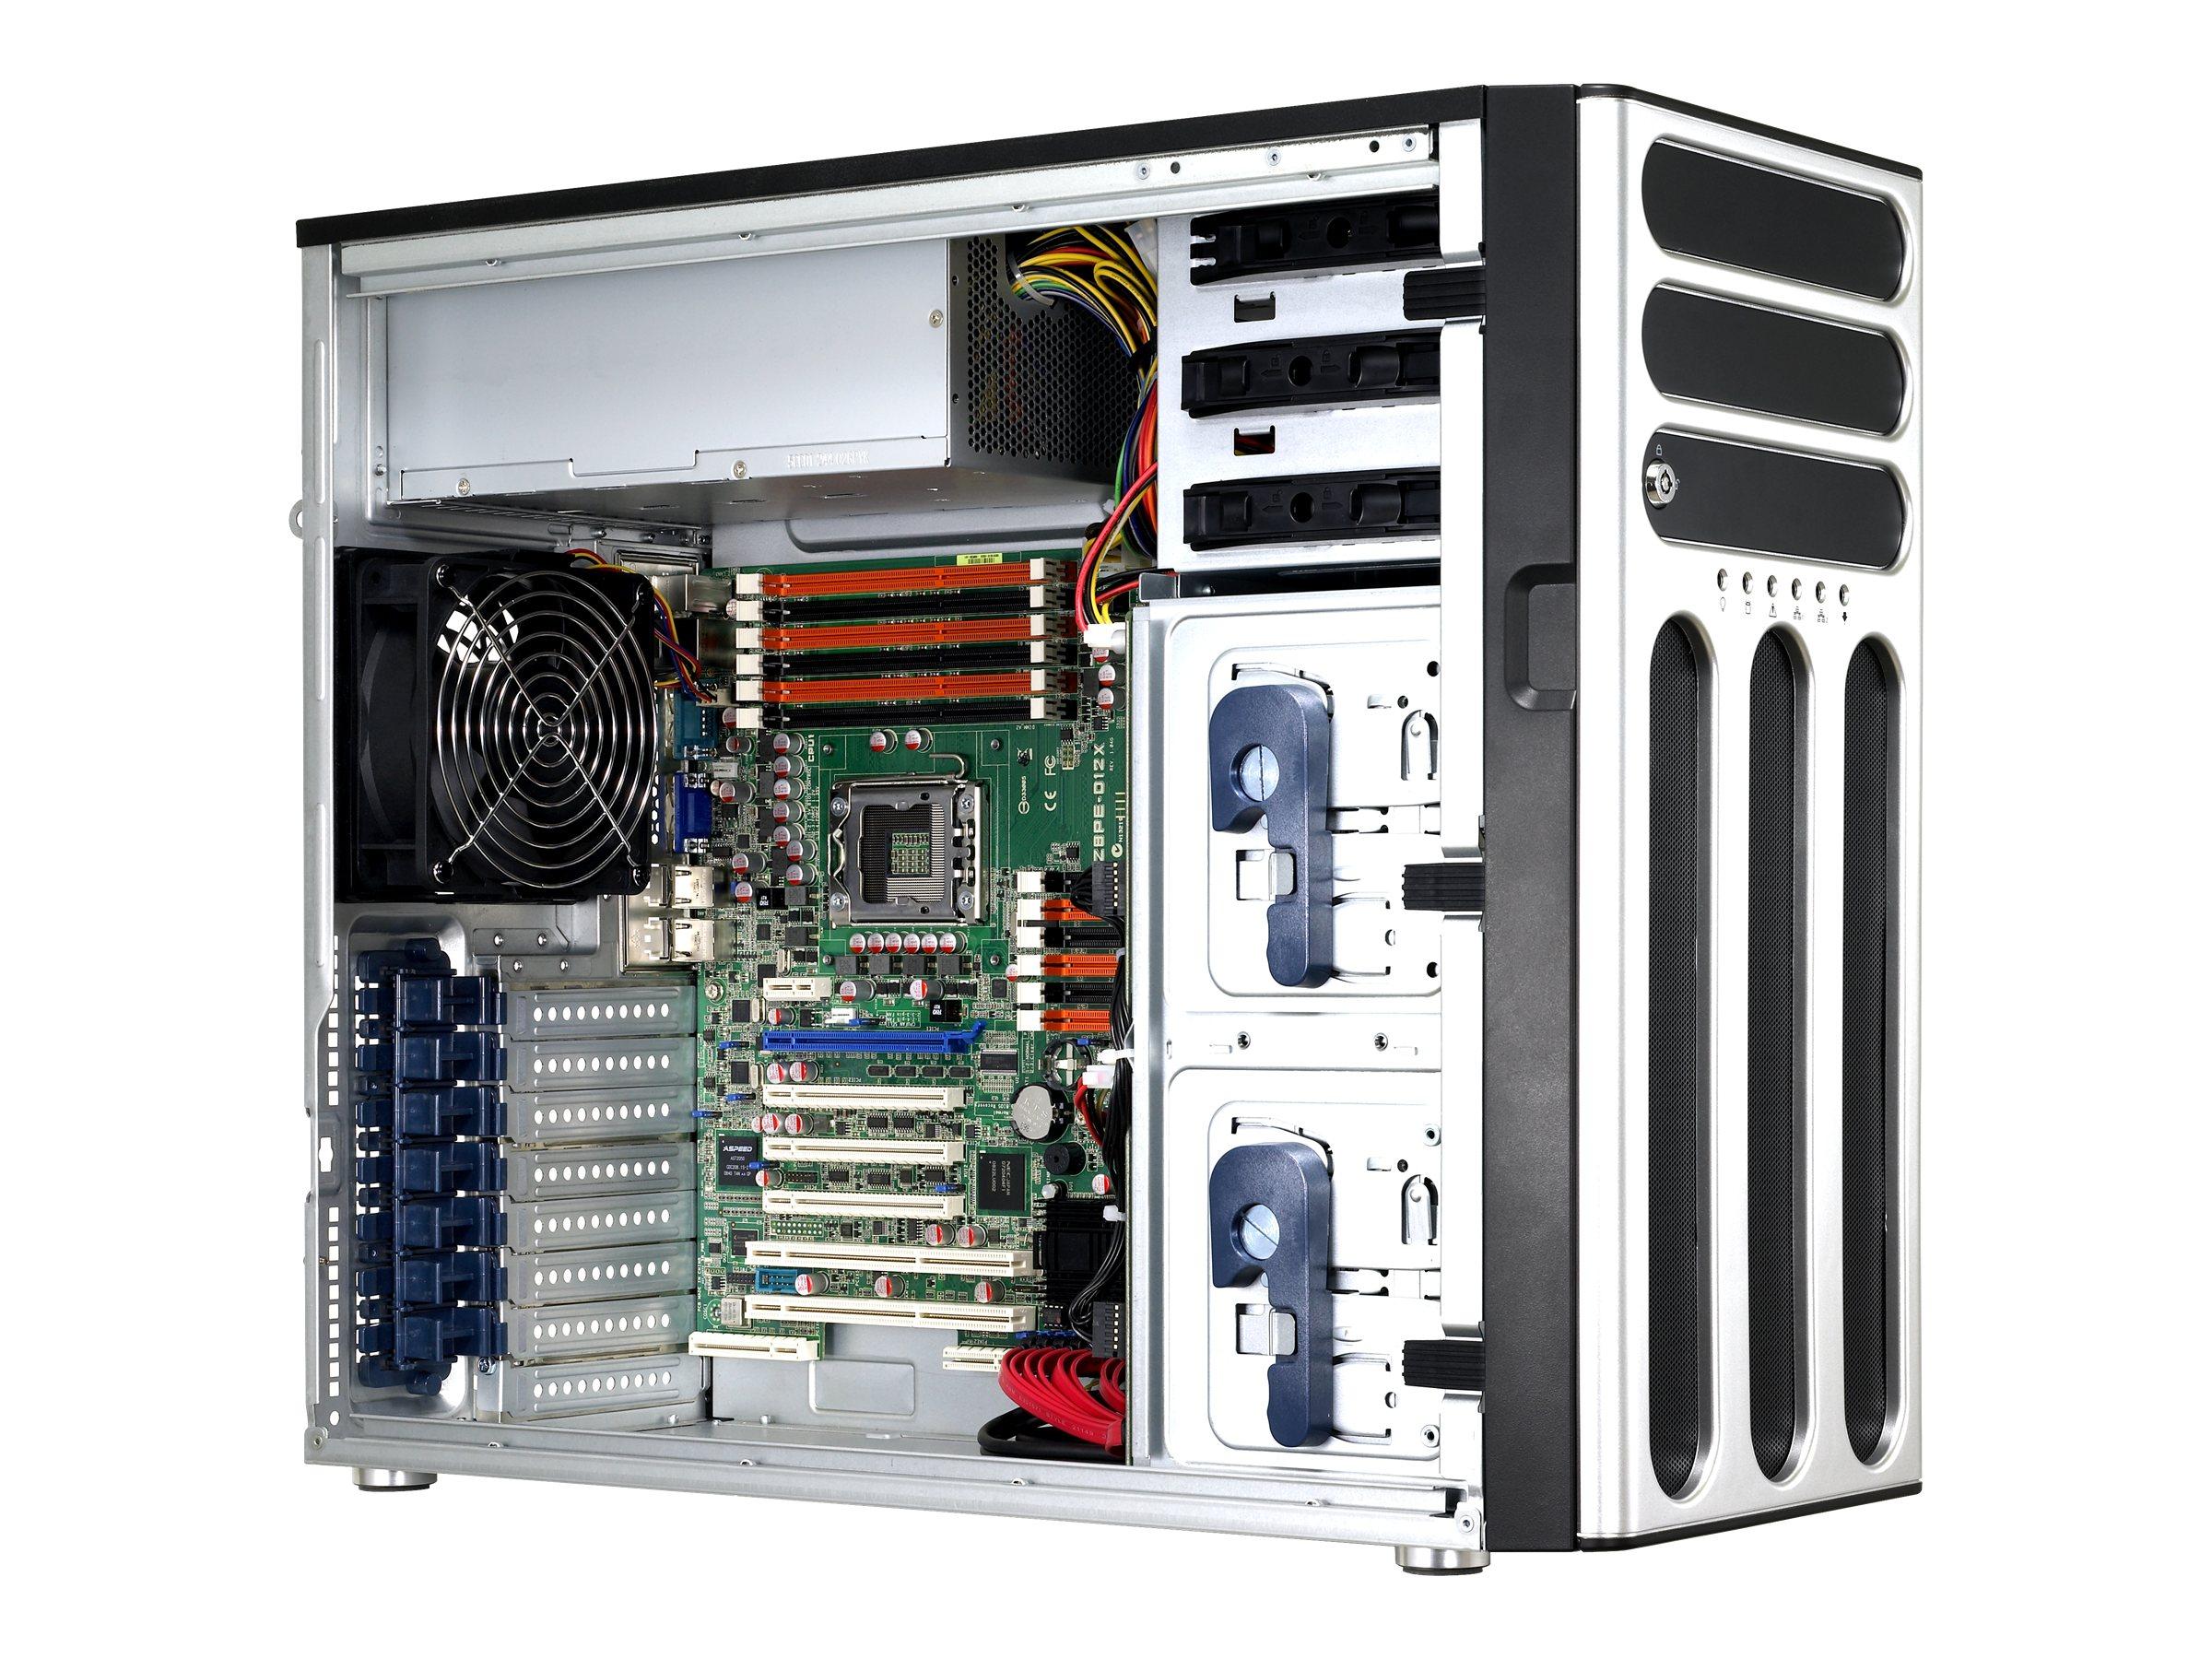 Asus TS700-E7/RS8 Image 3